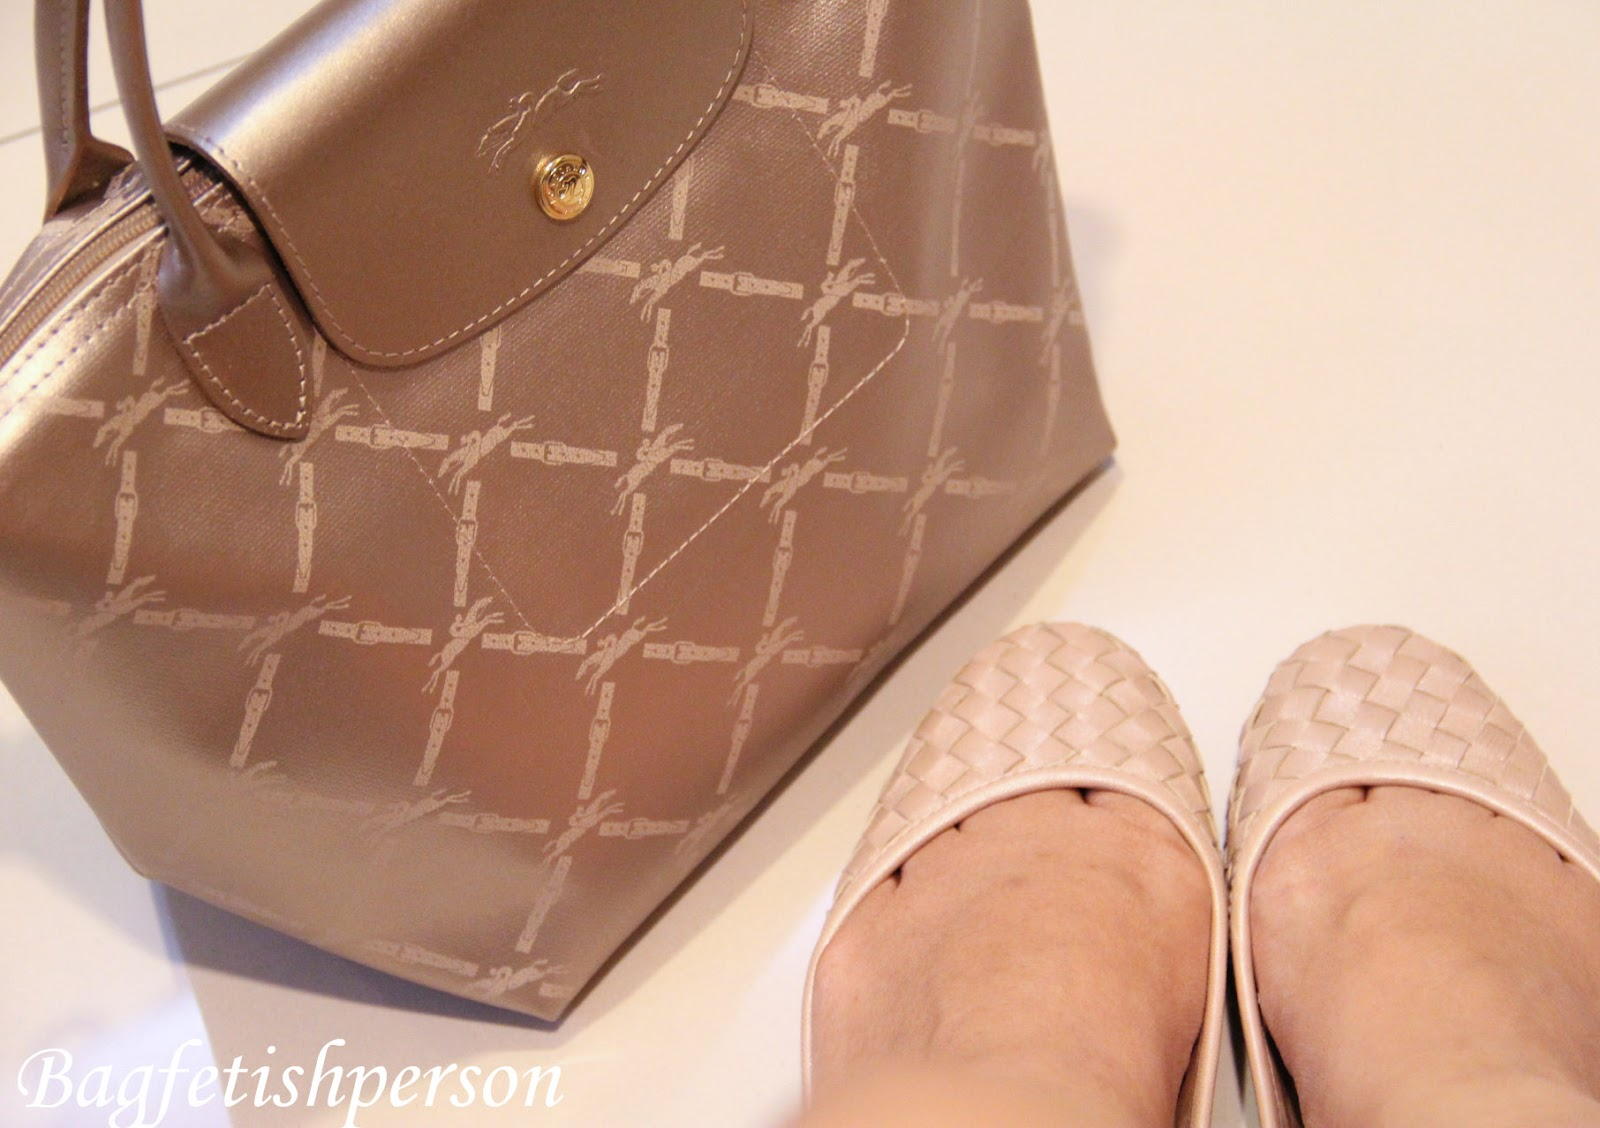 http://2.bp.blogspot.com/-N3aXSMasTUQ/T4GnUjIHN-I/AAAAAAAACVE/9NhZx4iZkh8/s1600/Longchamp+LM+rosegold+and+pla+cream+wicker+flat+shoes-1.jpg